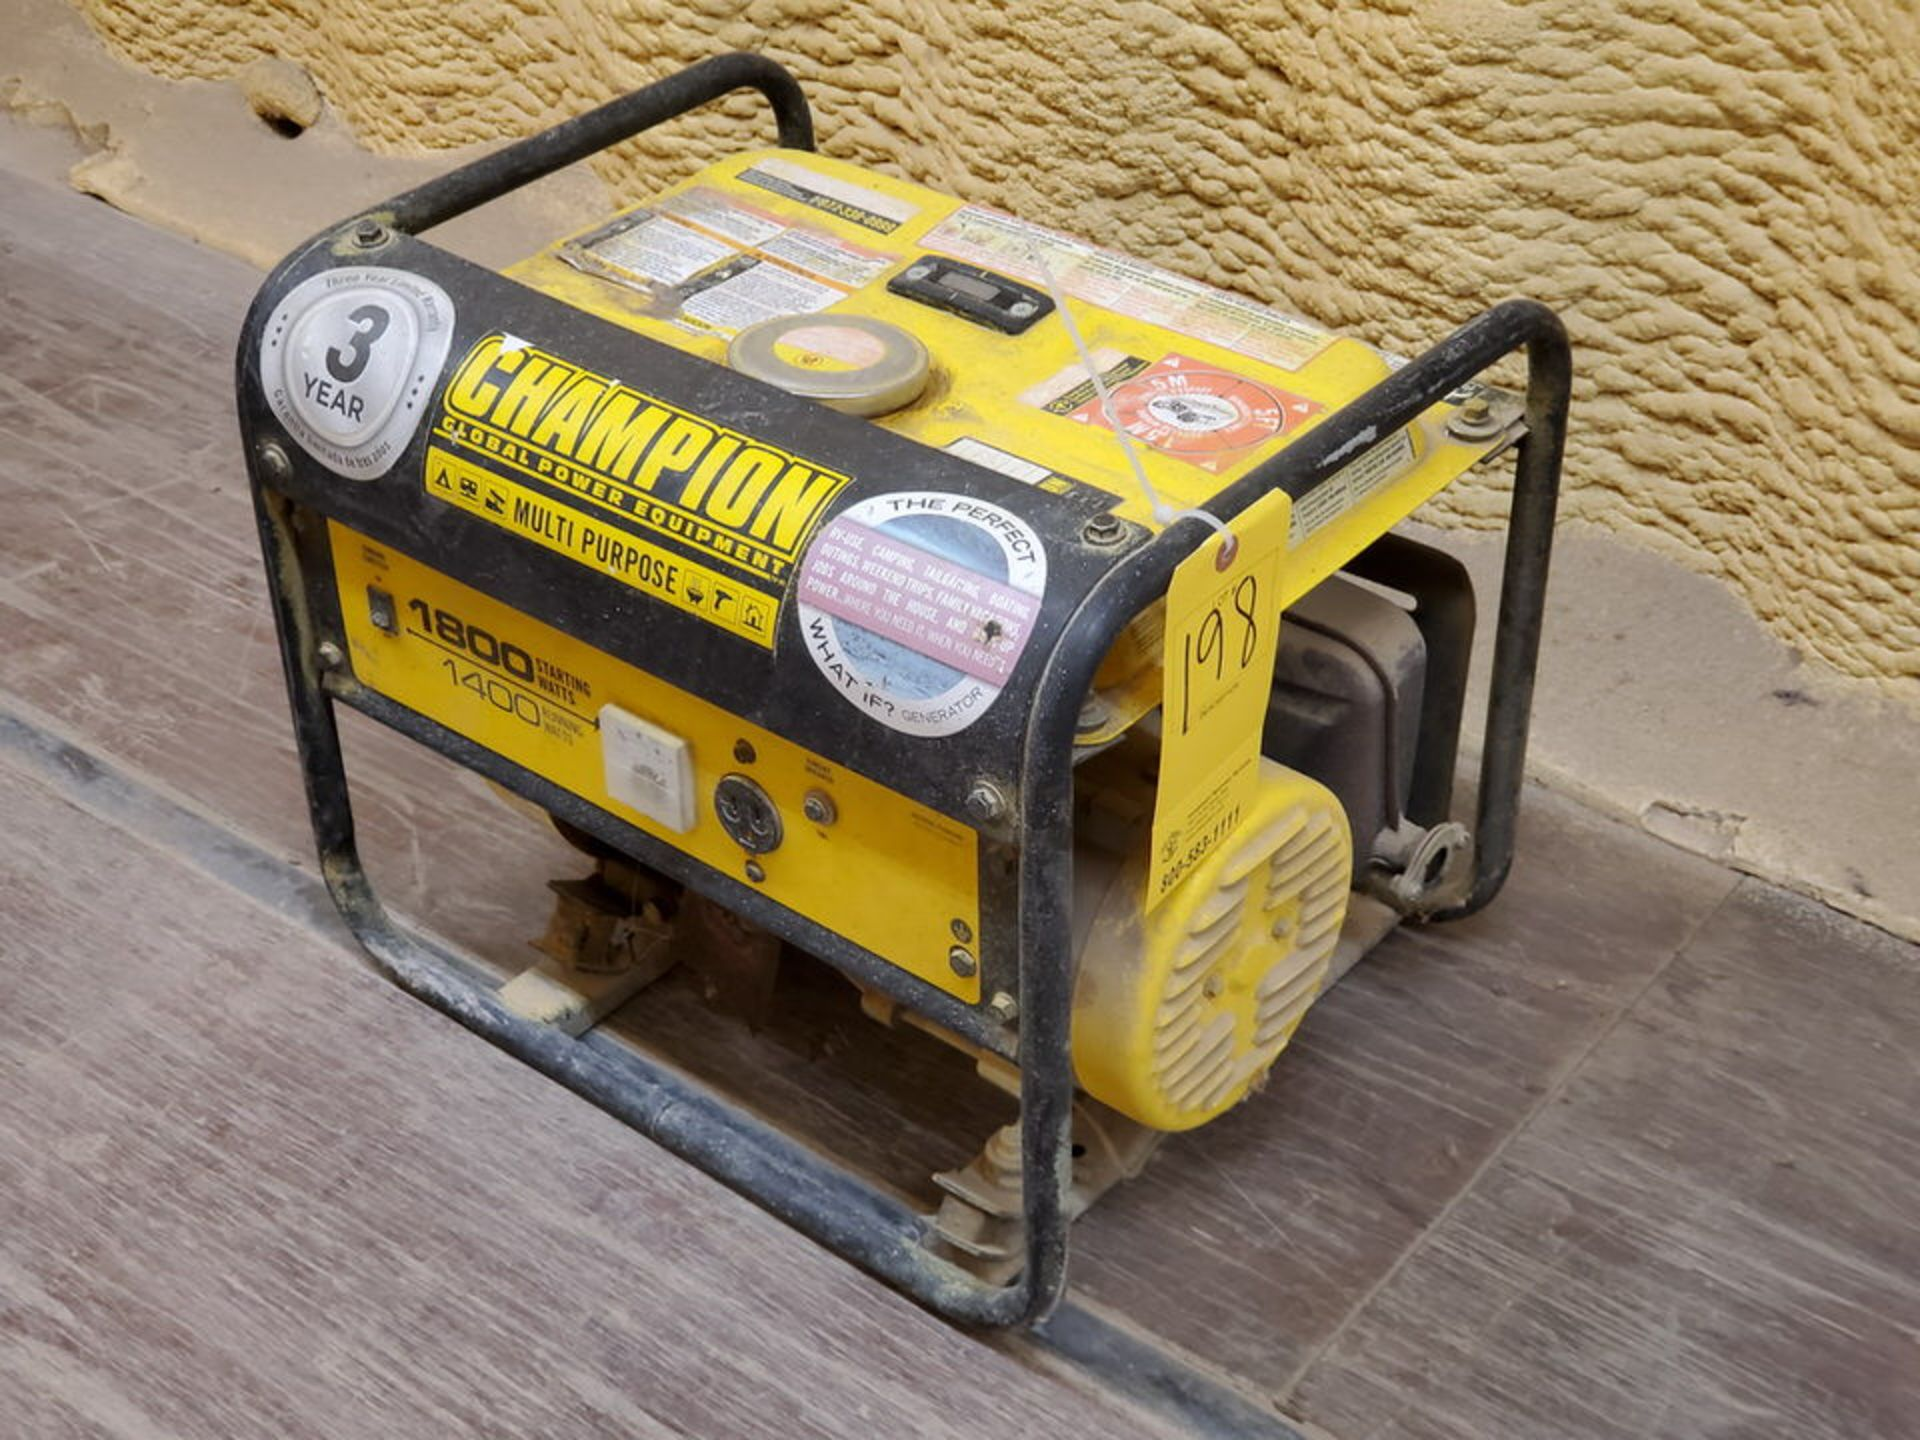 Champion 42432 Portable Generator 1400W, W/ 80cc Engine, 1PH, 60HZ, 120V, 11.7A